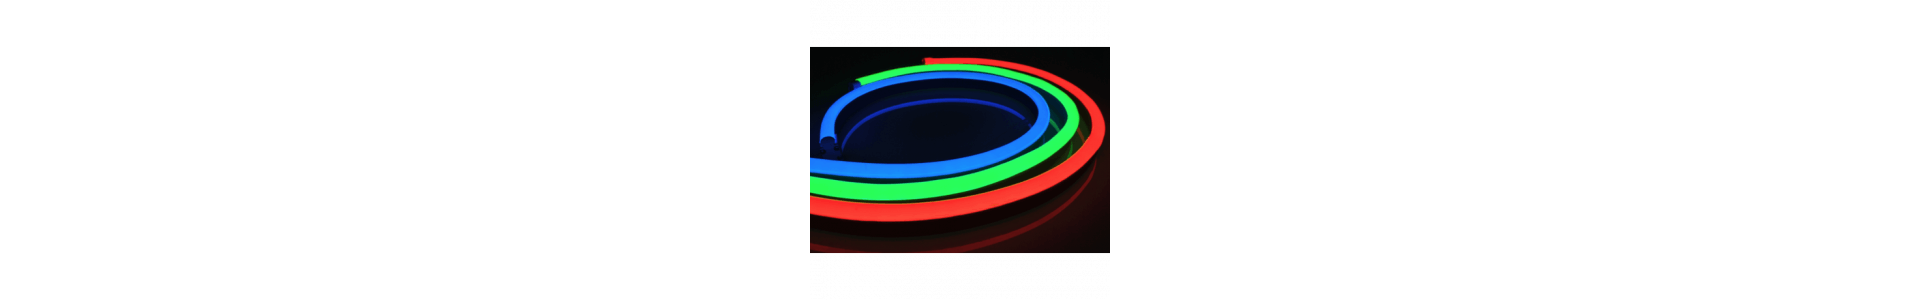 230V LED Neonslang